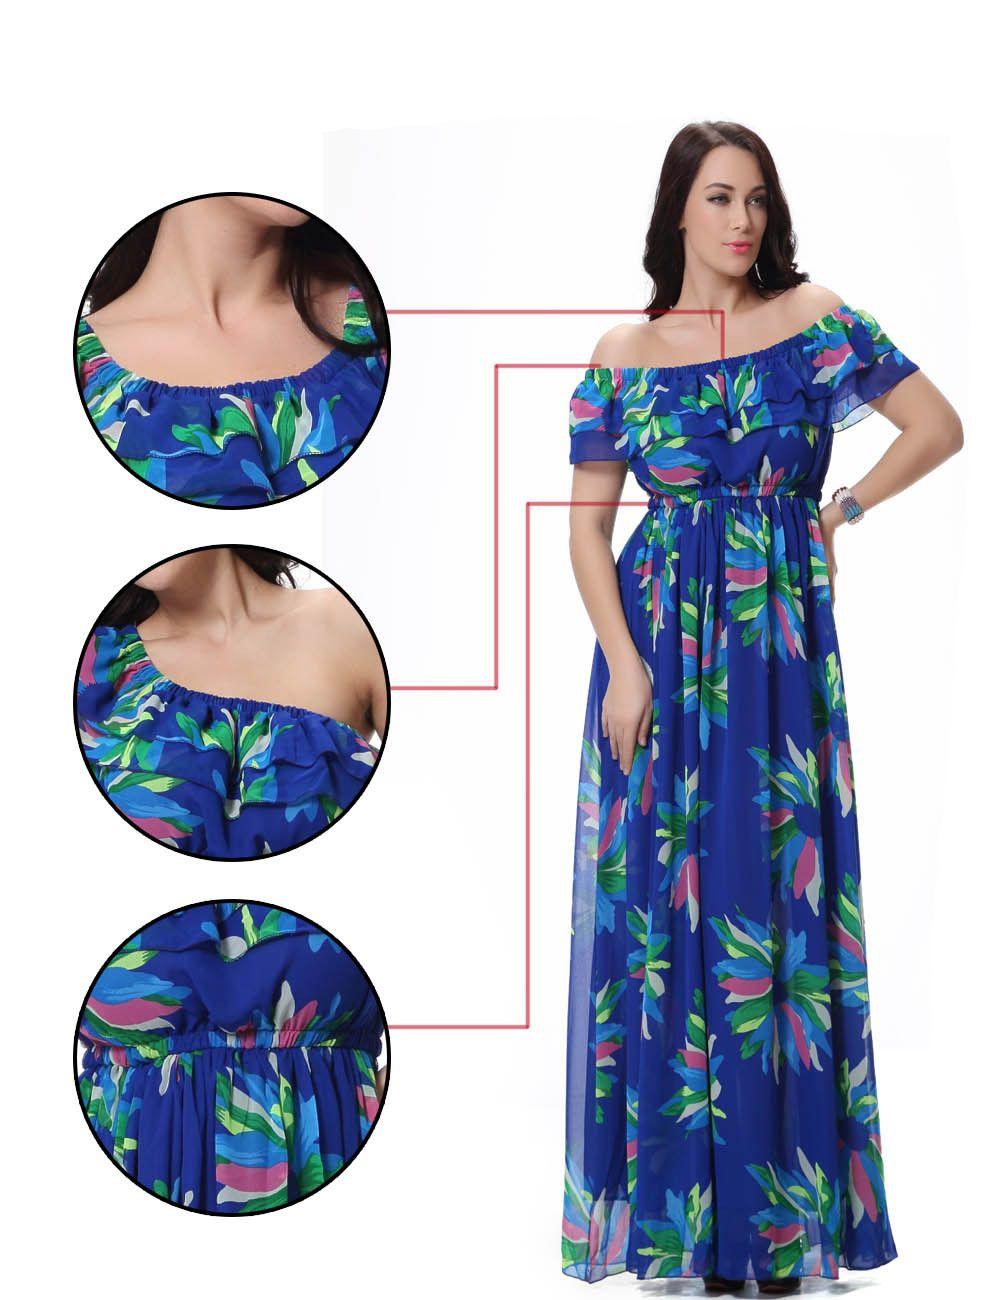 Fashion women plus size chiffon maxi dress short sleeve off shoulder